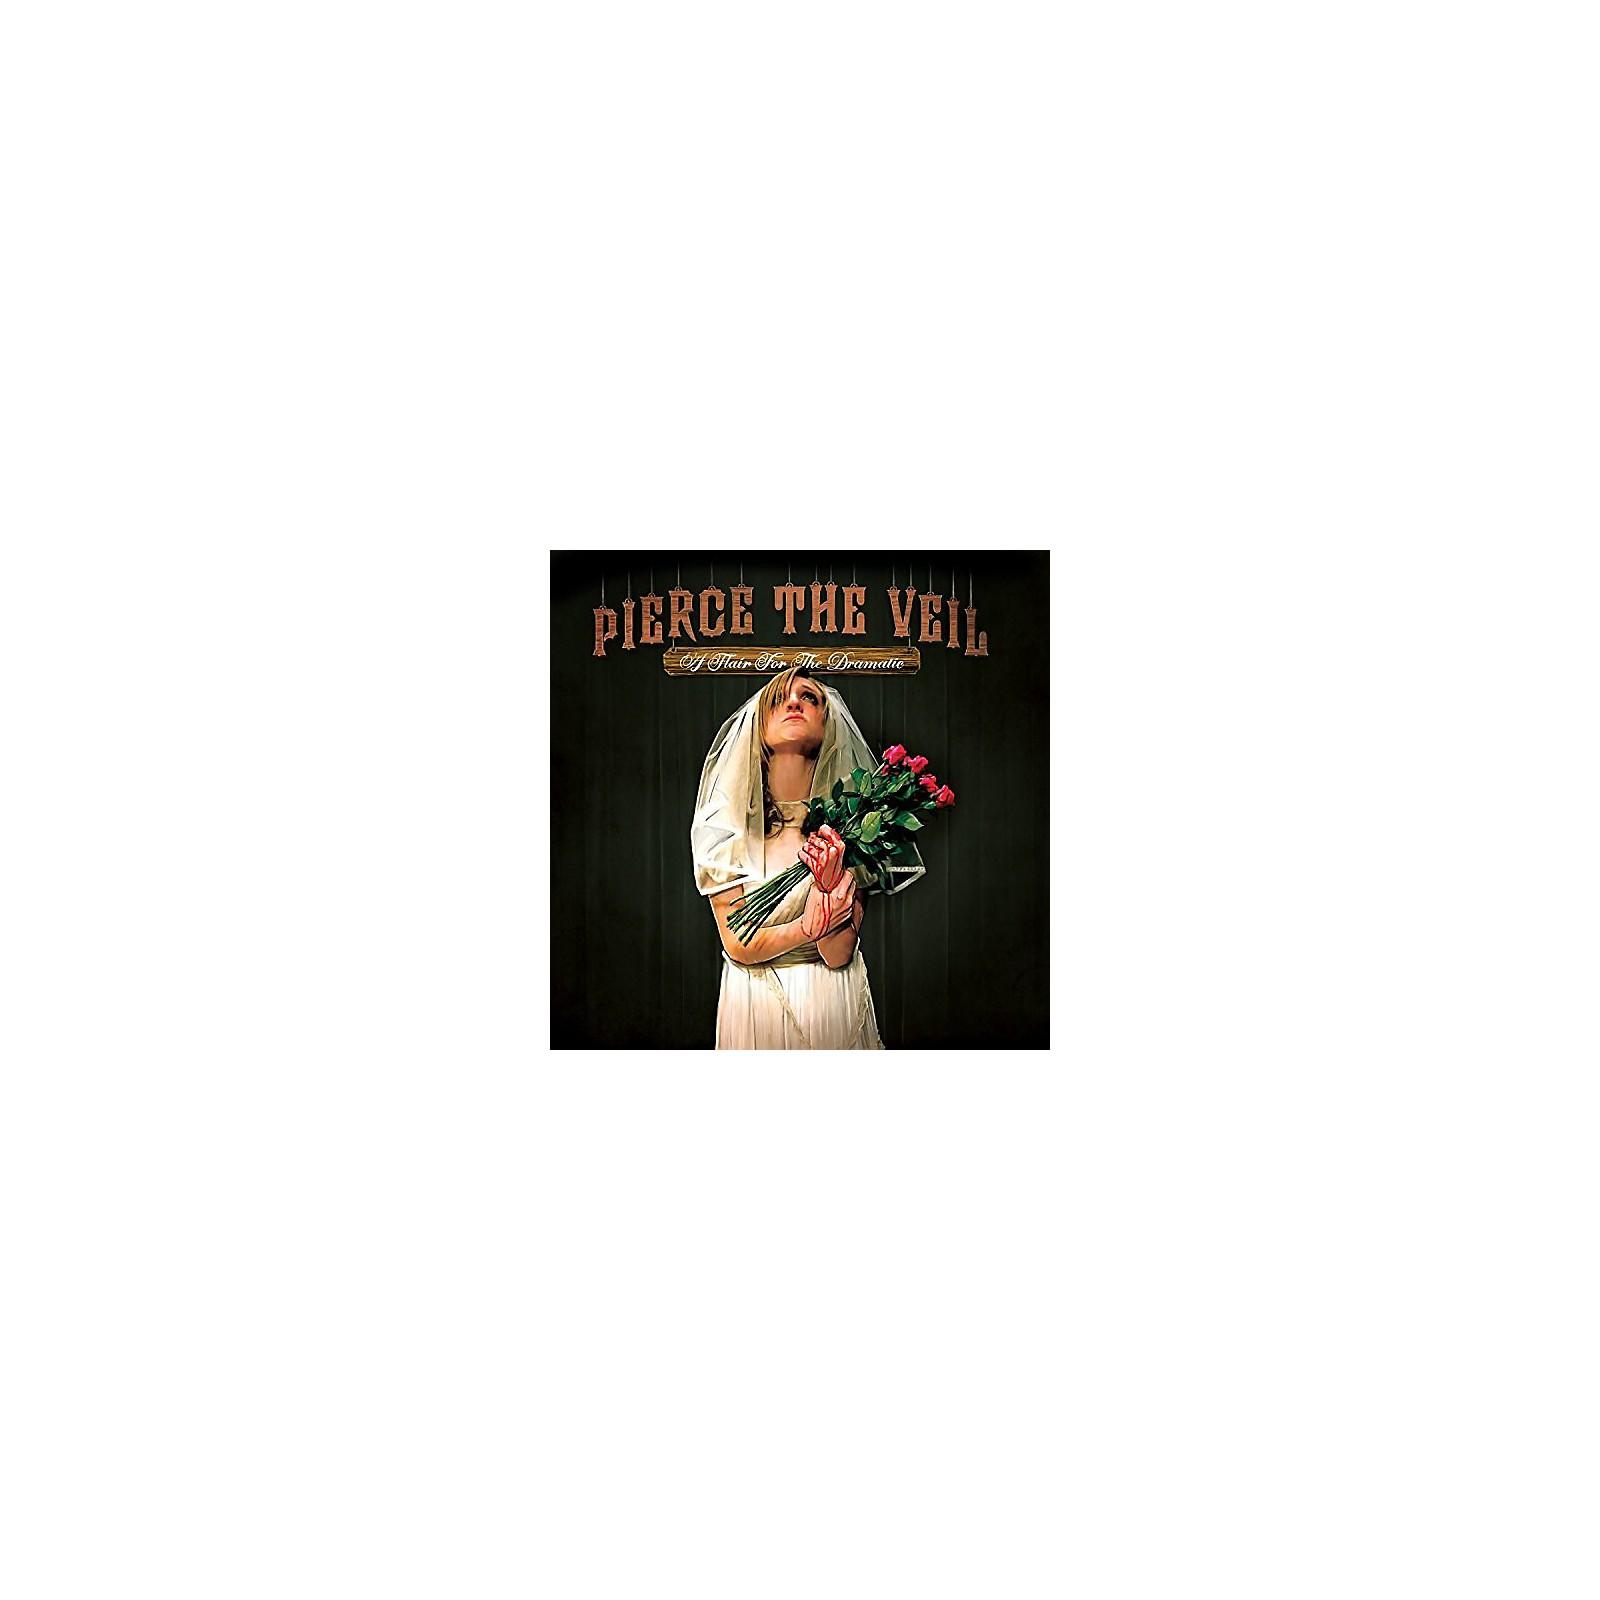 Alliance Pierce the Veil - A Flair For The Dramatic: 10 Year Anniversary Edition